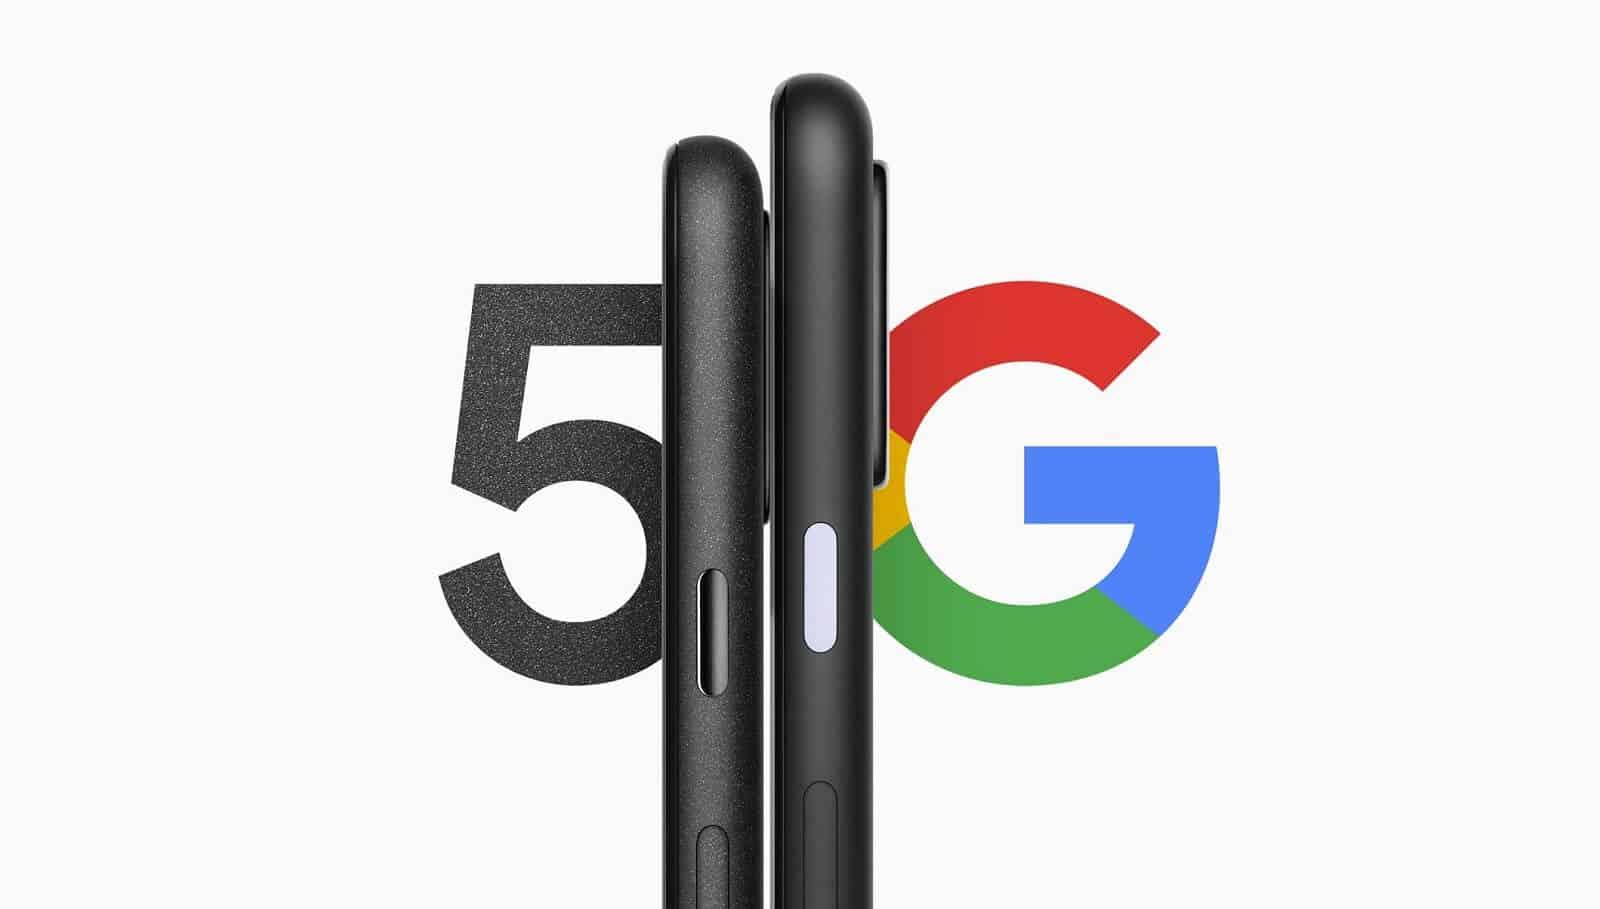 Gogle Pixel 4a 5G